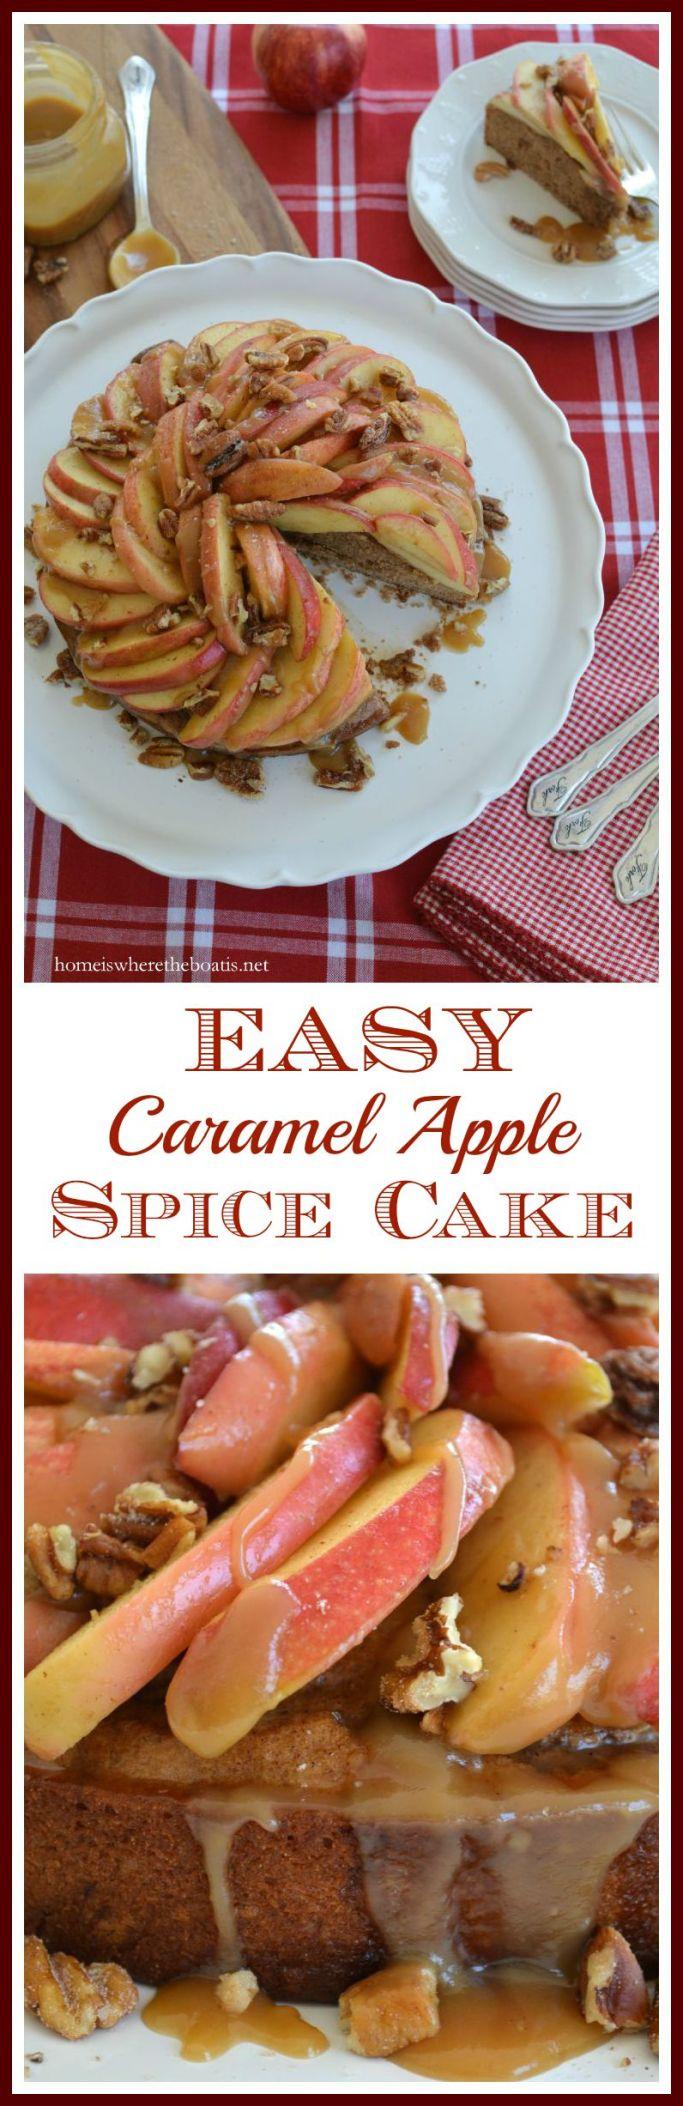 Easy Caramel Apple Spice Cake